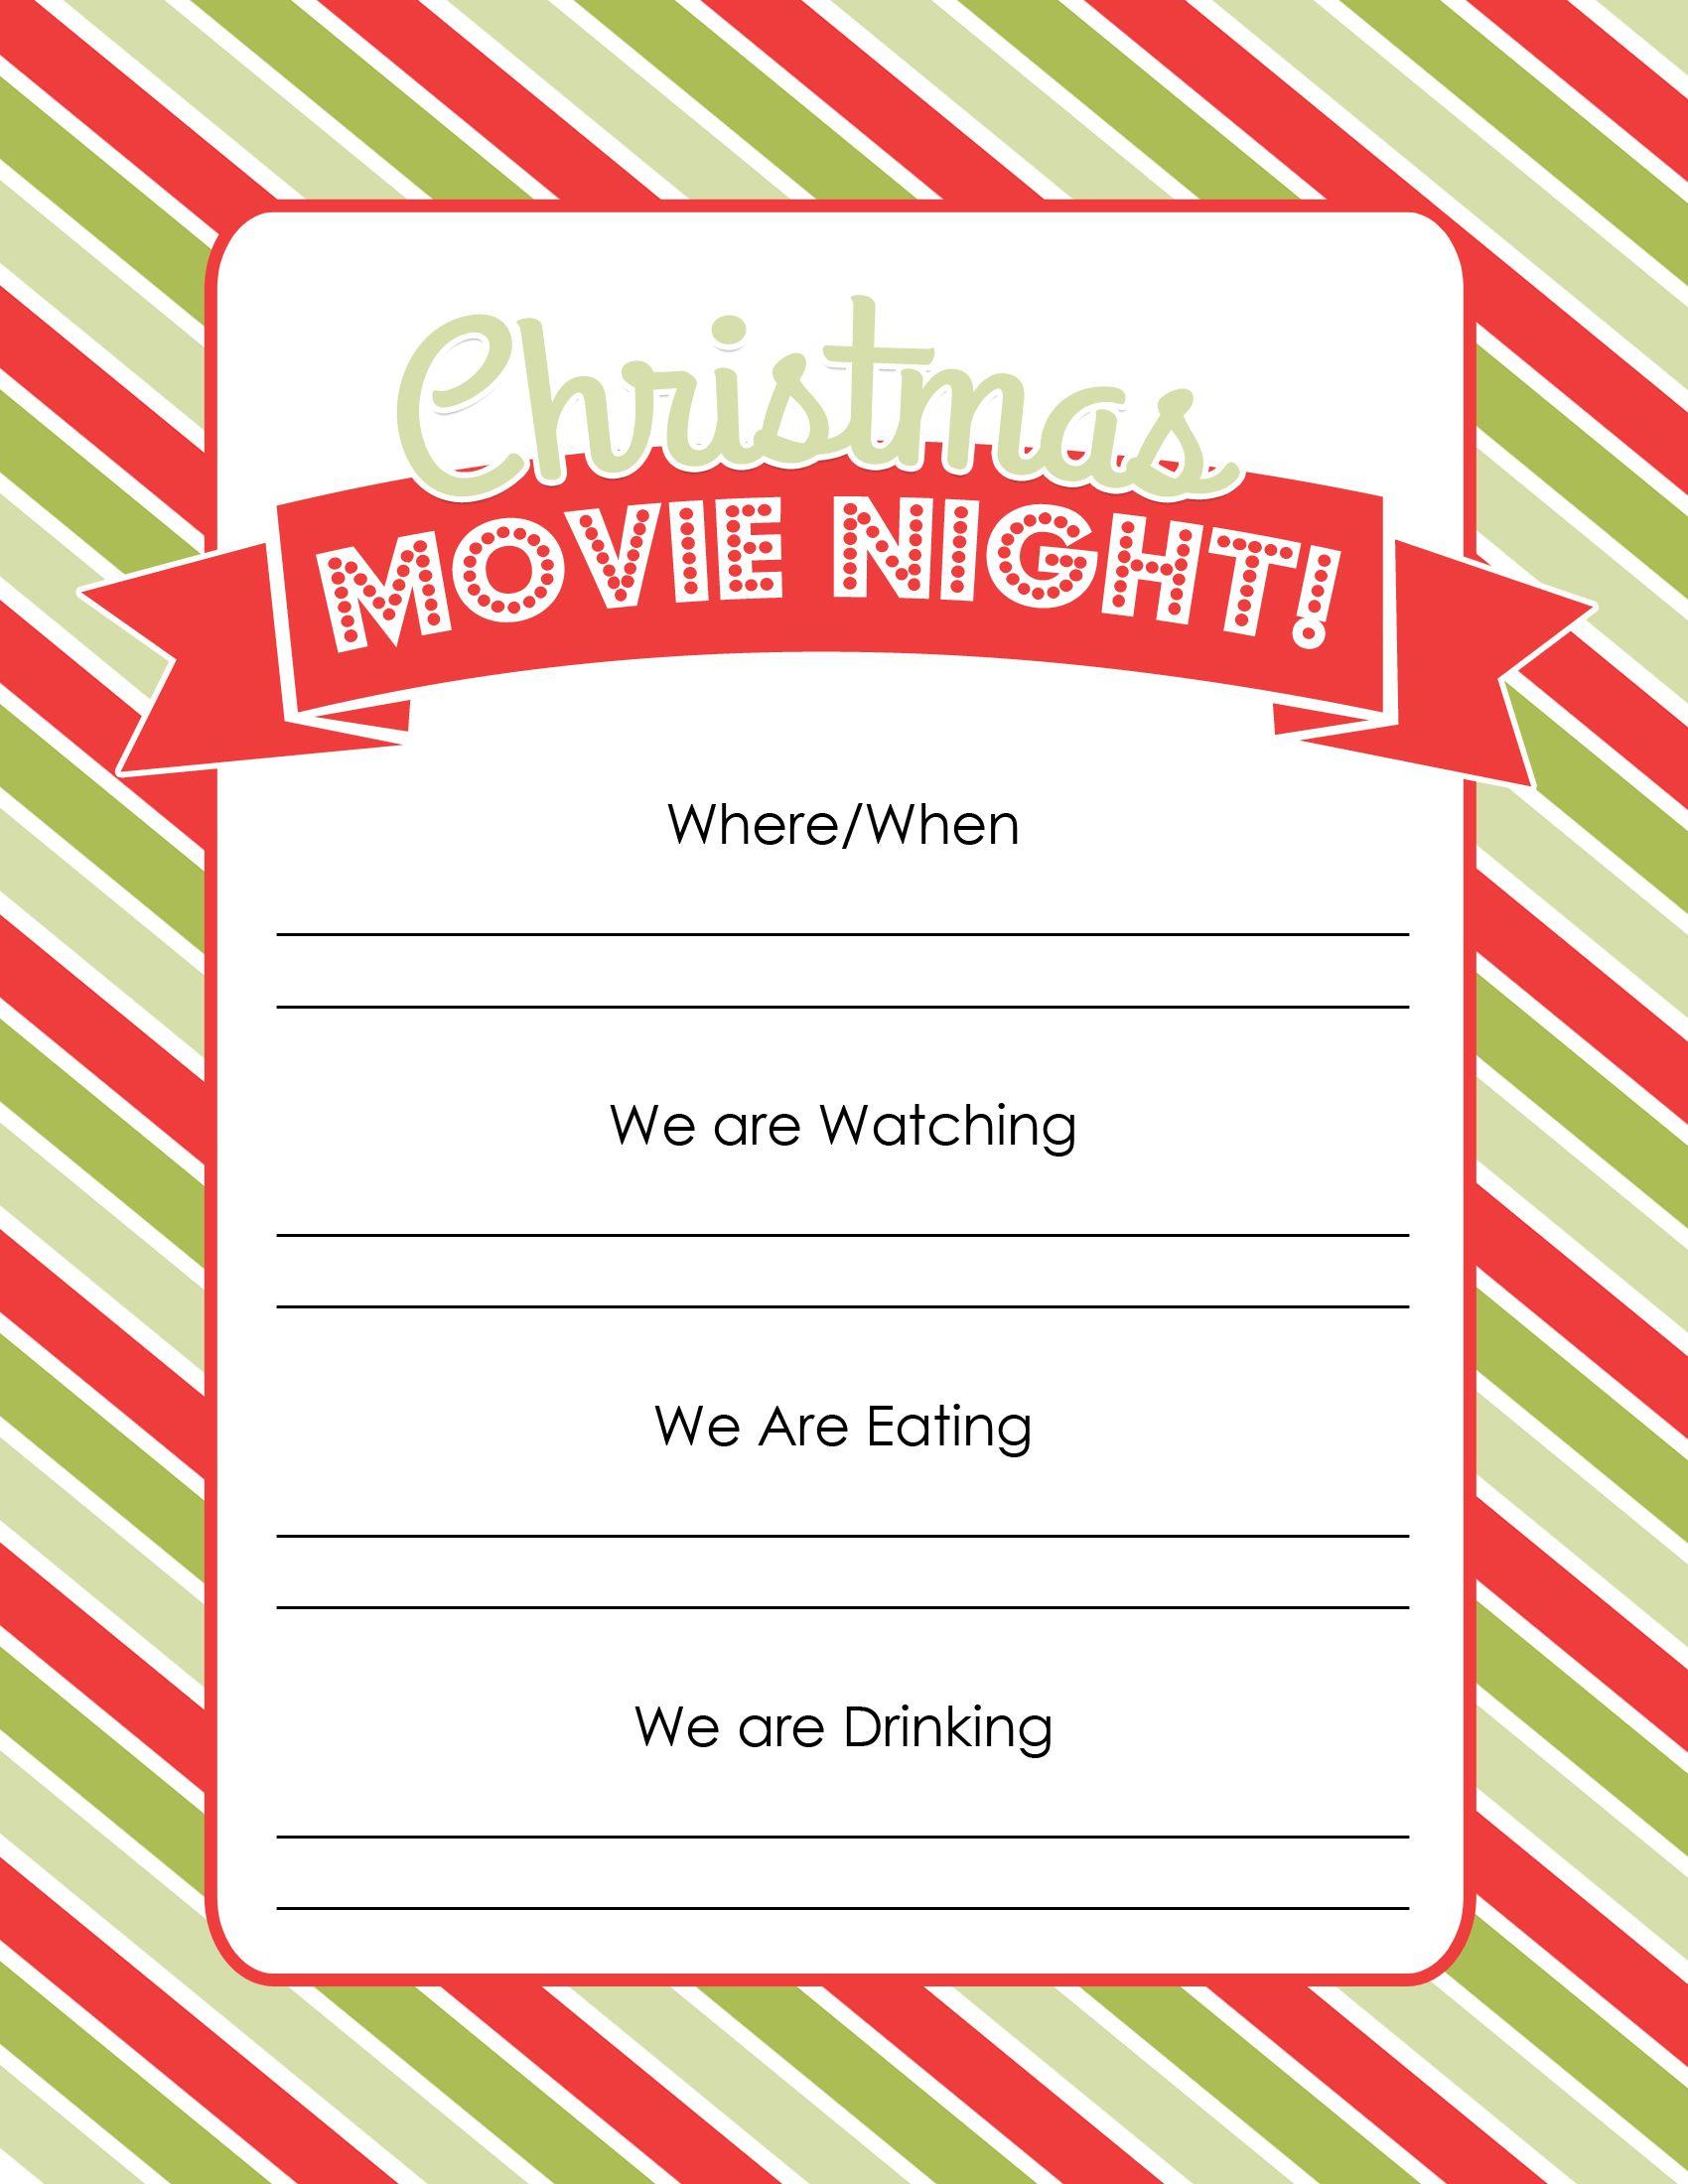 Christmas Movie Night Christmas movie night, Christmas